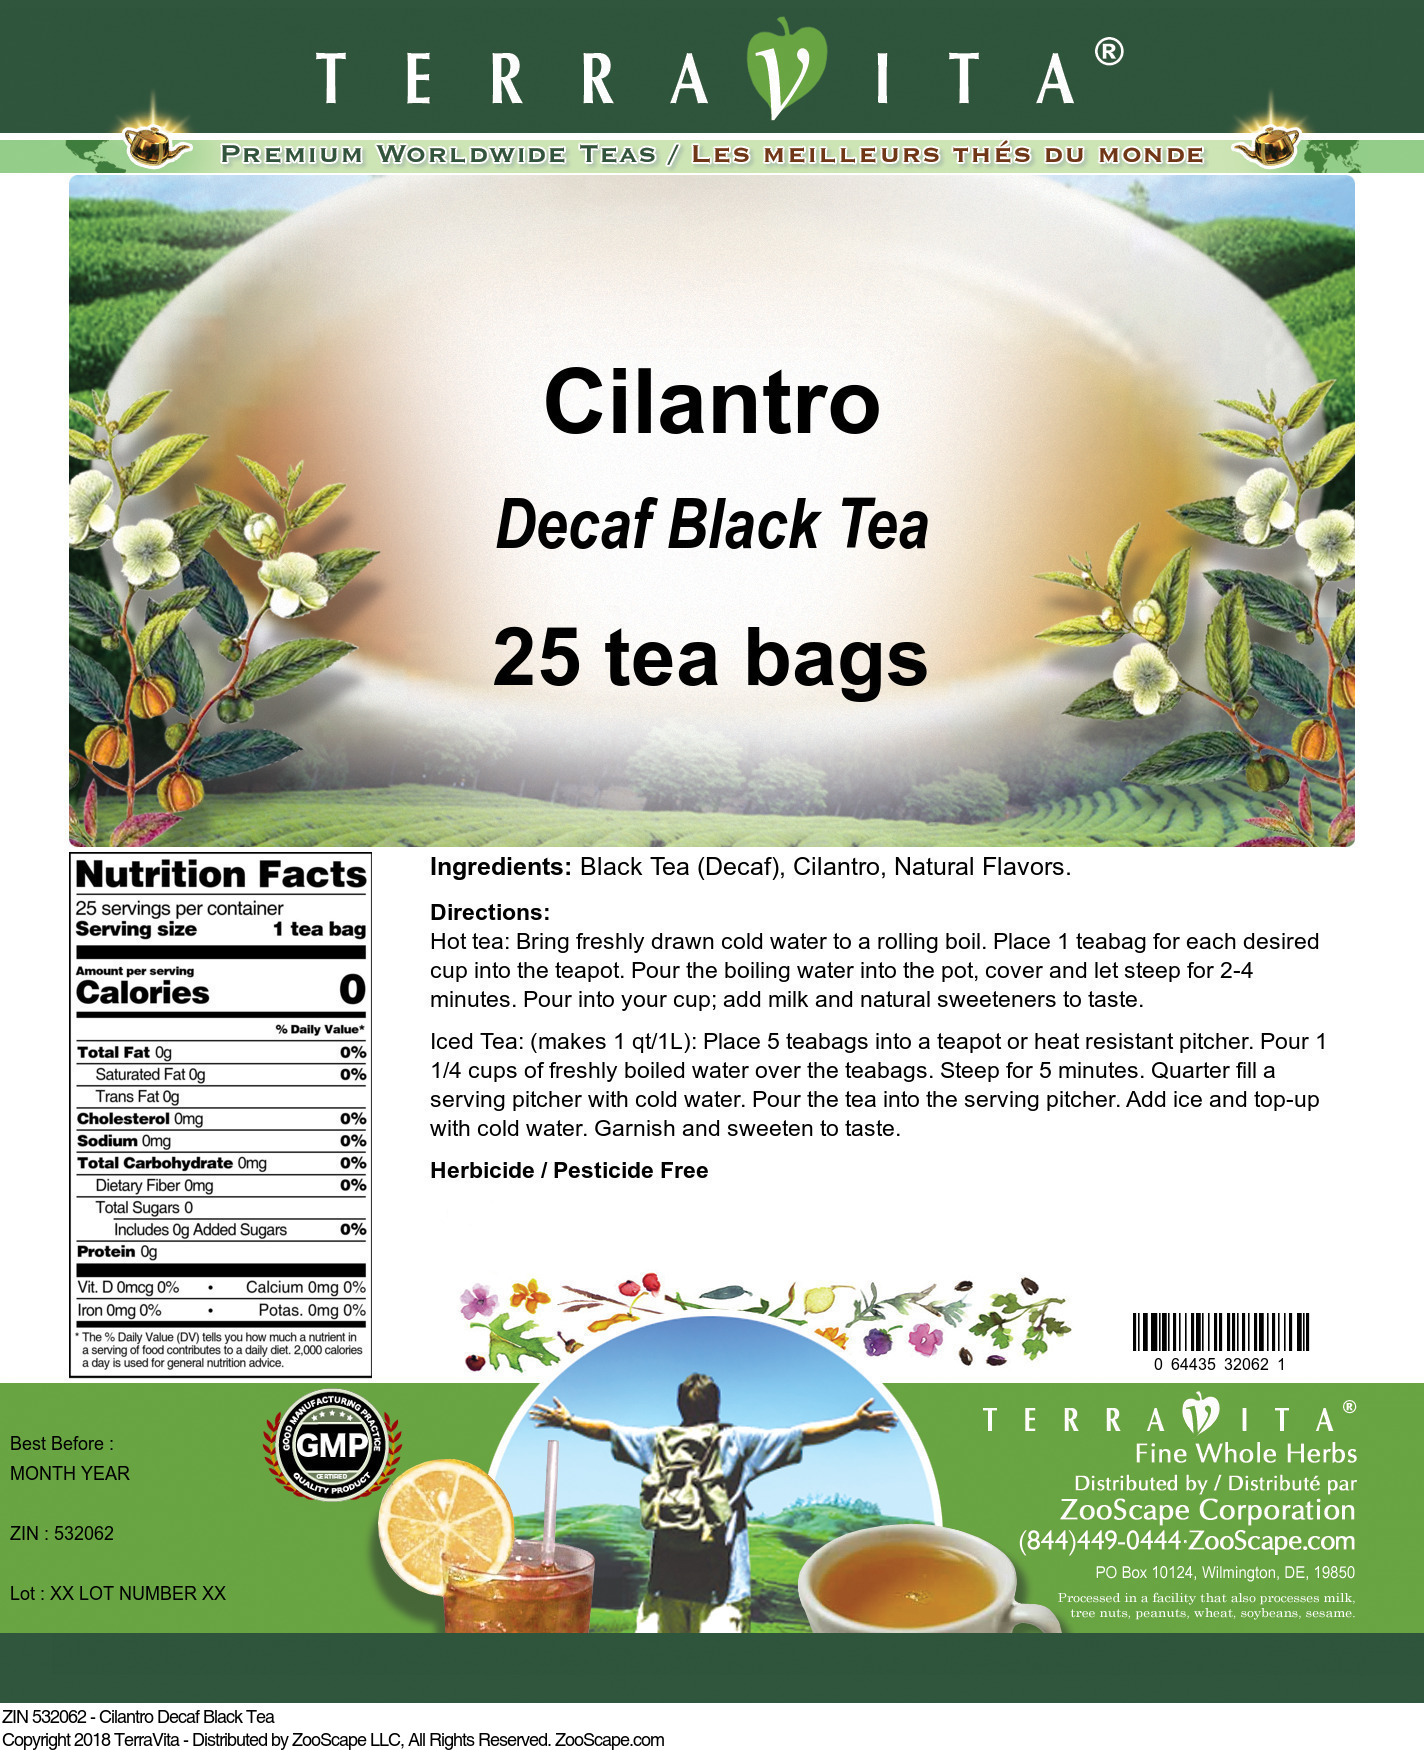 Cilantro Decaf Black Tea